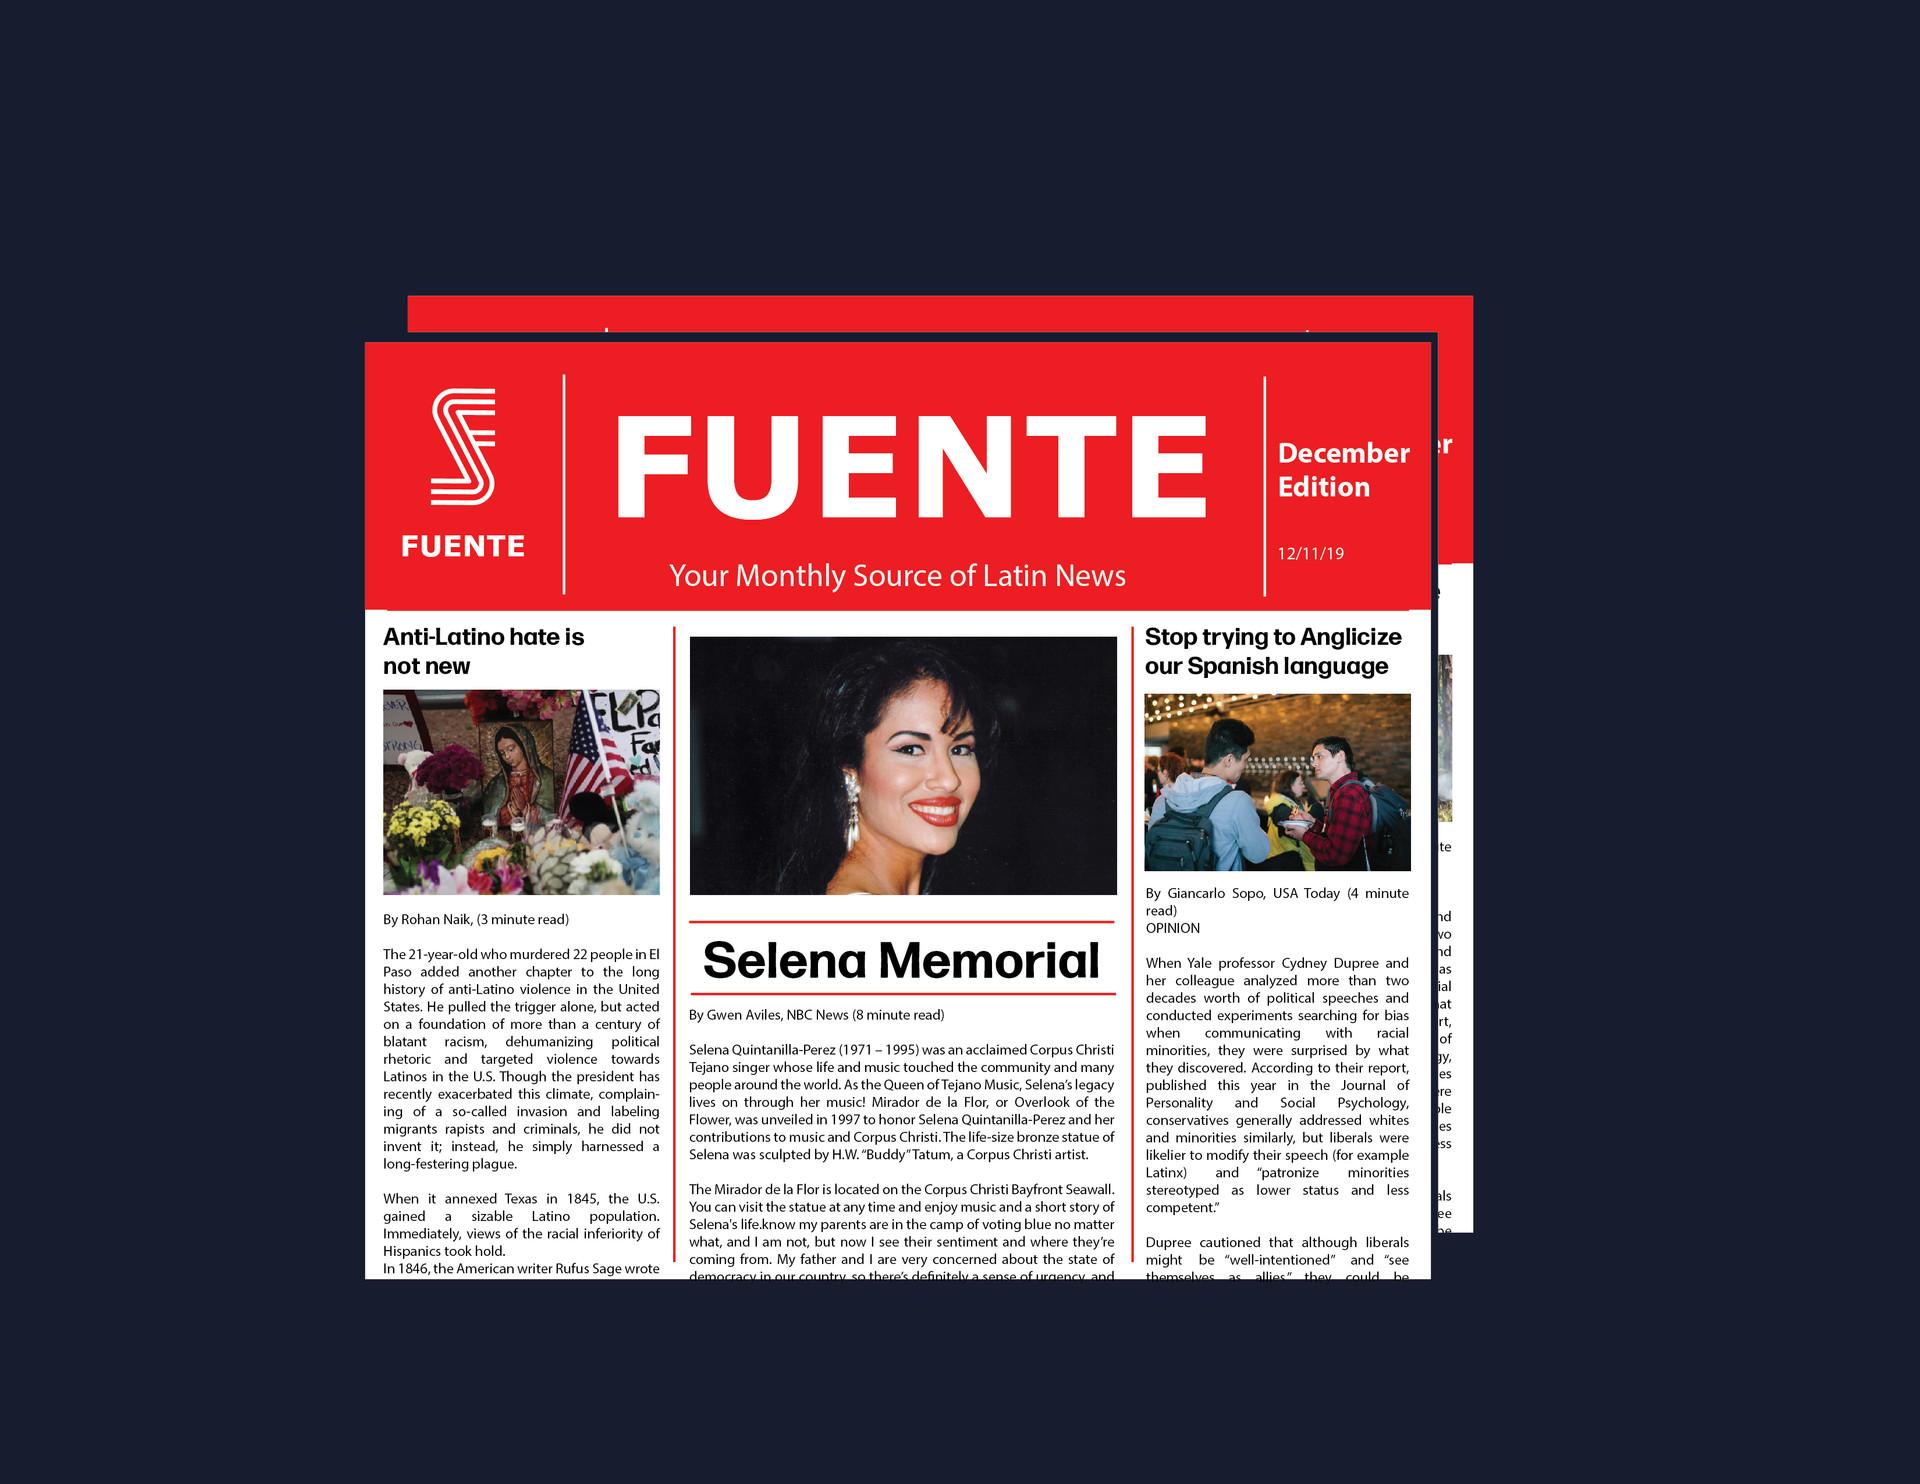 Fuente-Newspaper.jpg